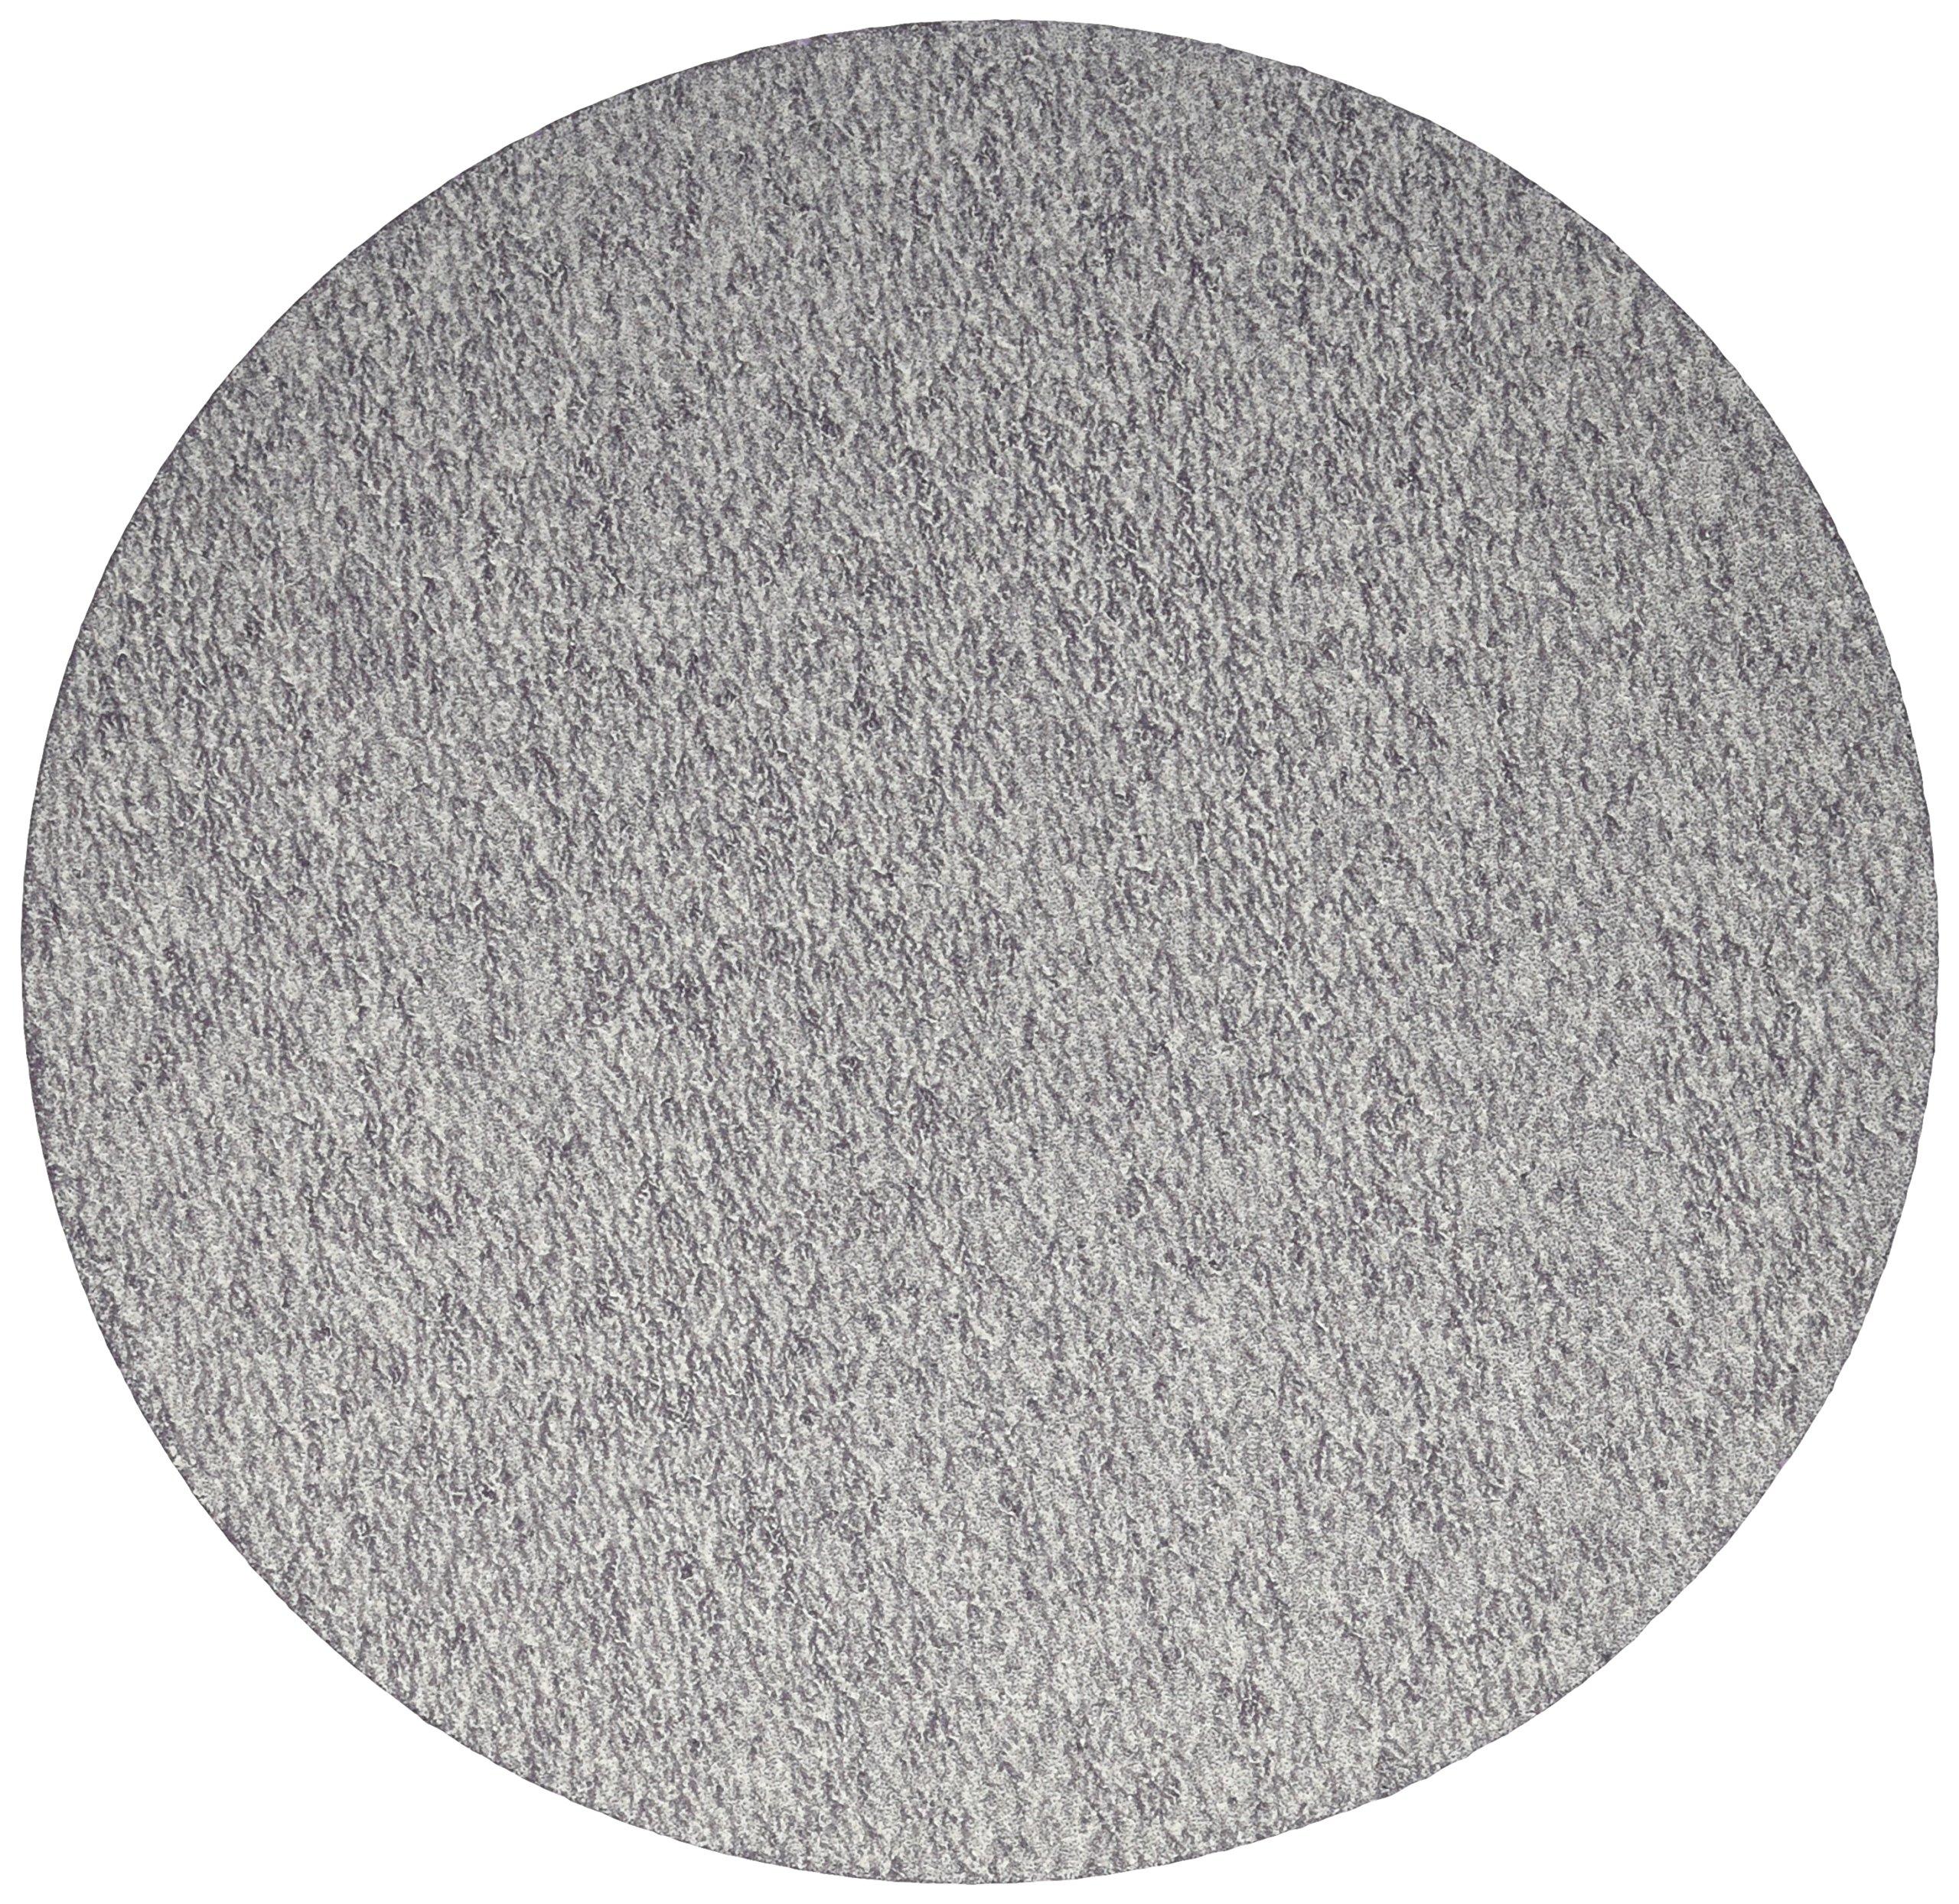 3M 01743 Imperial Hookit 745I 8'' P80E Grit Disc